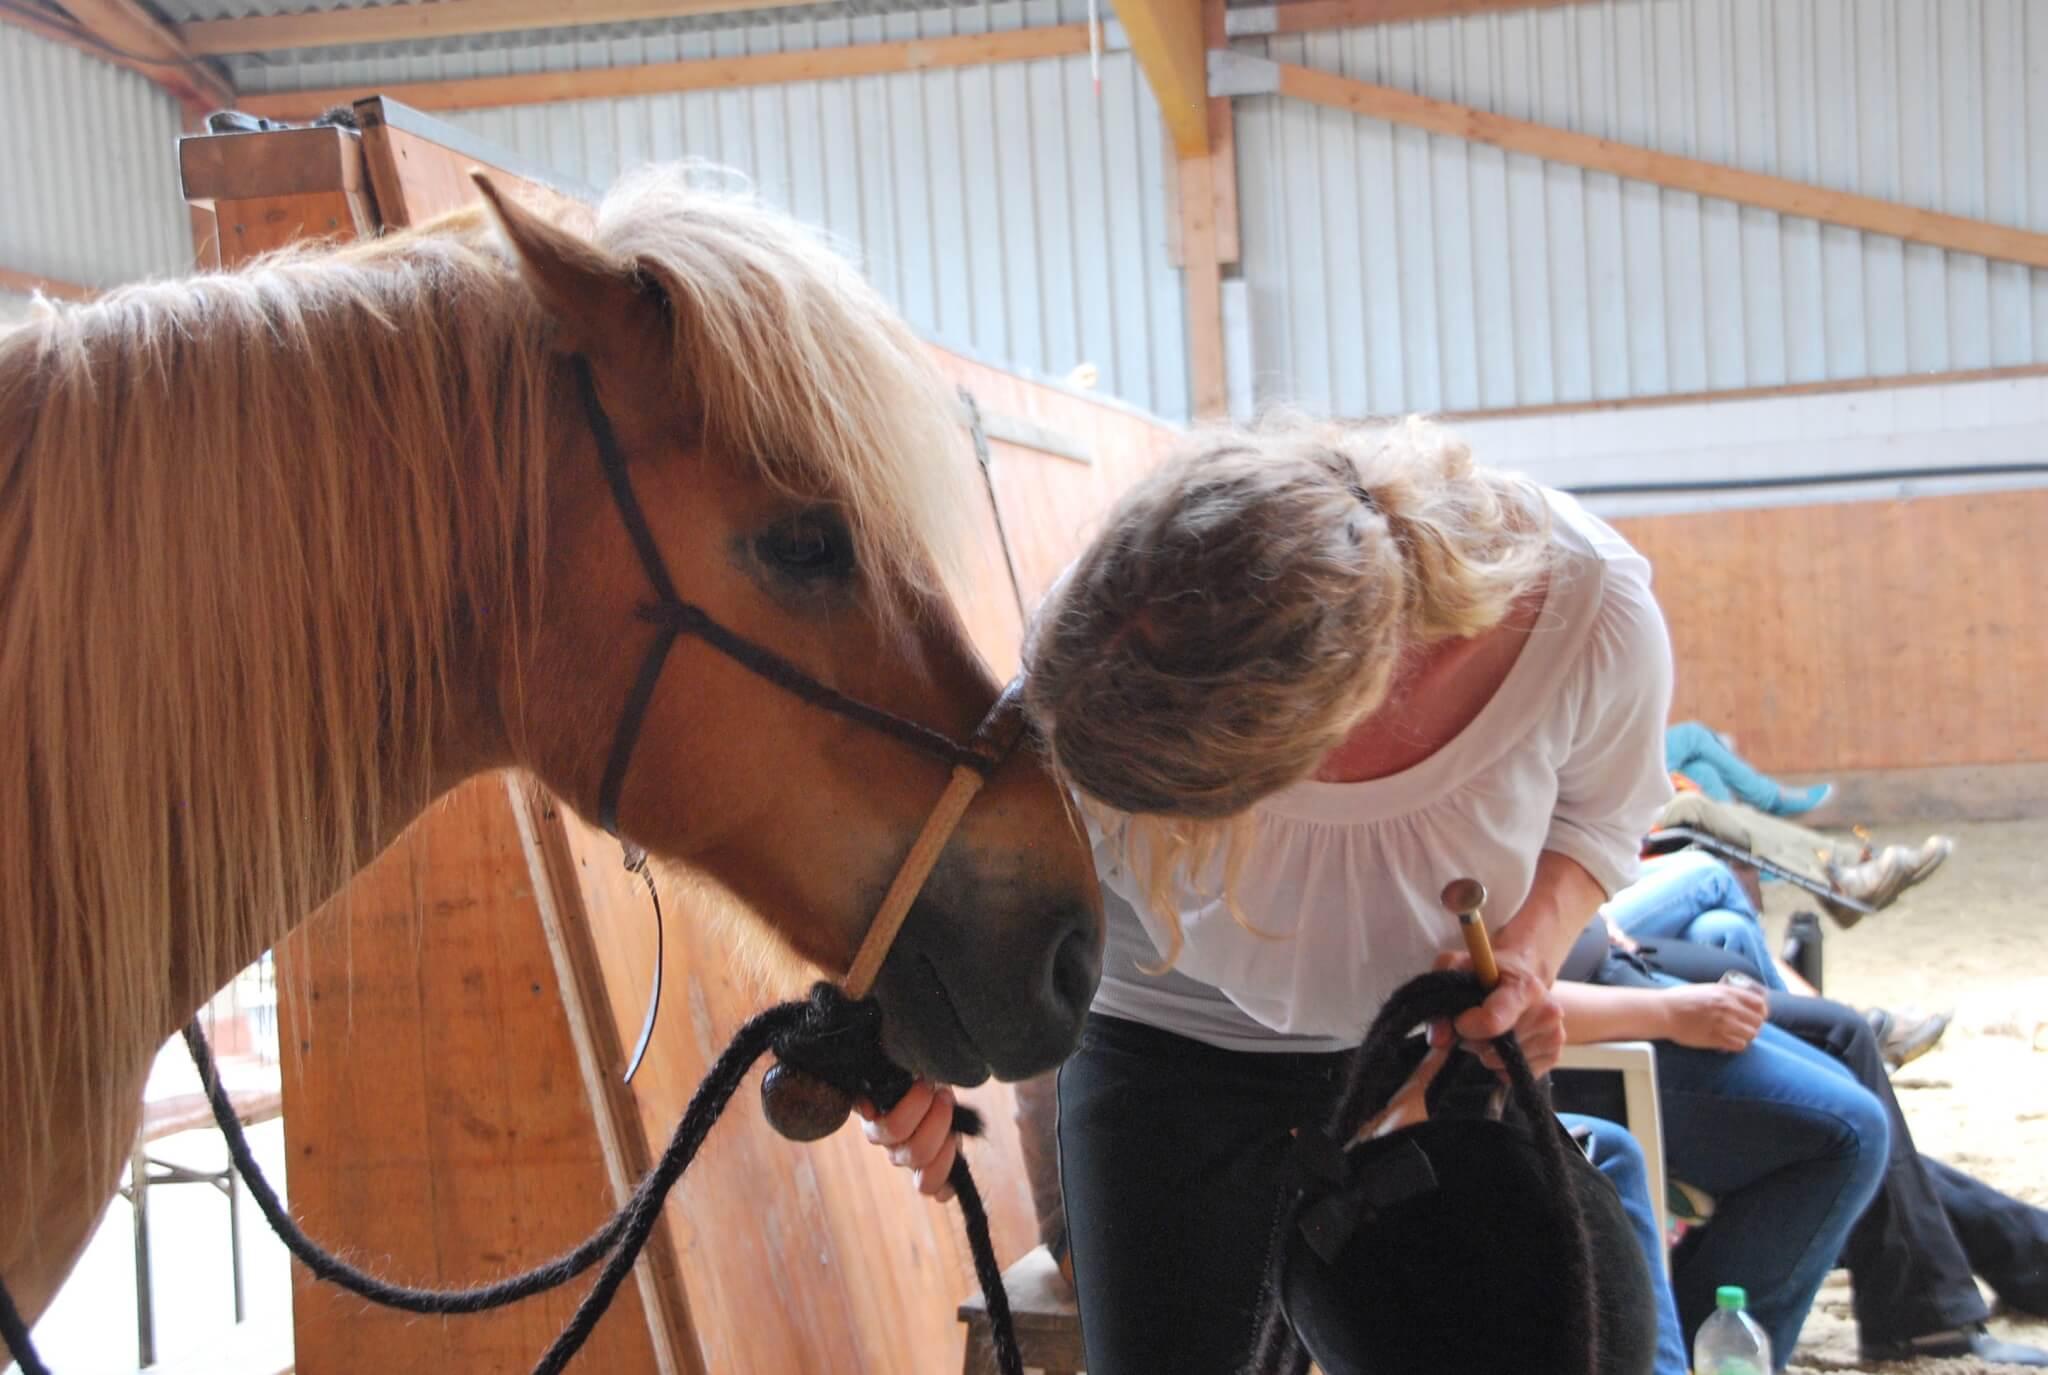 Amanda Barton Horsemanship-Kurs – vielleicht der schönste G20-Gegenpol